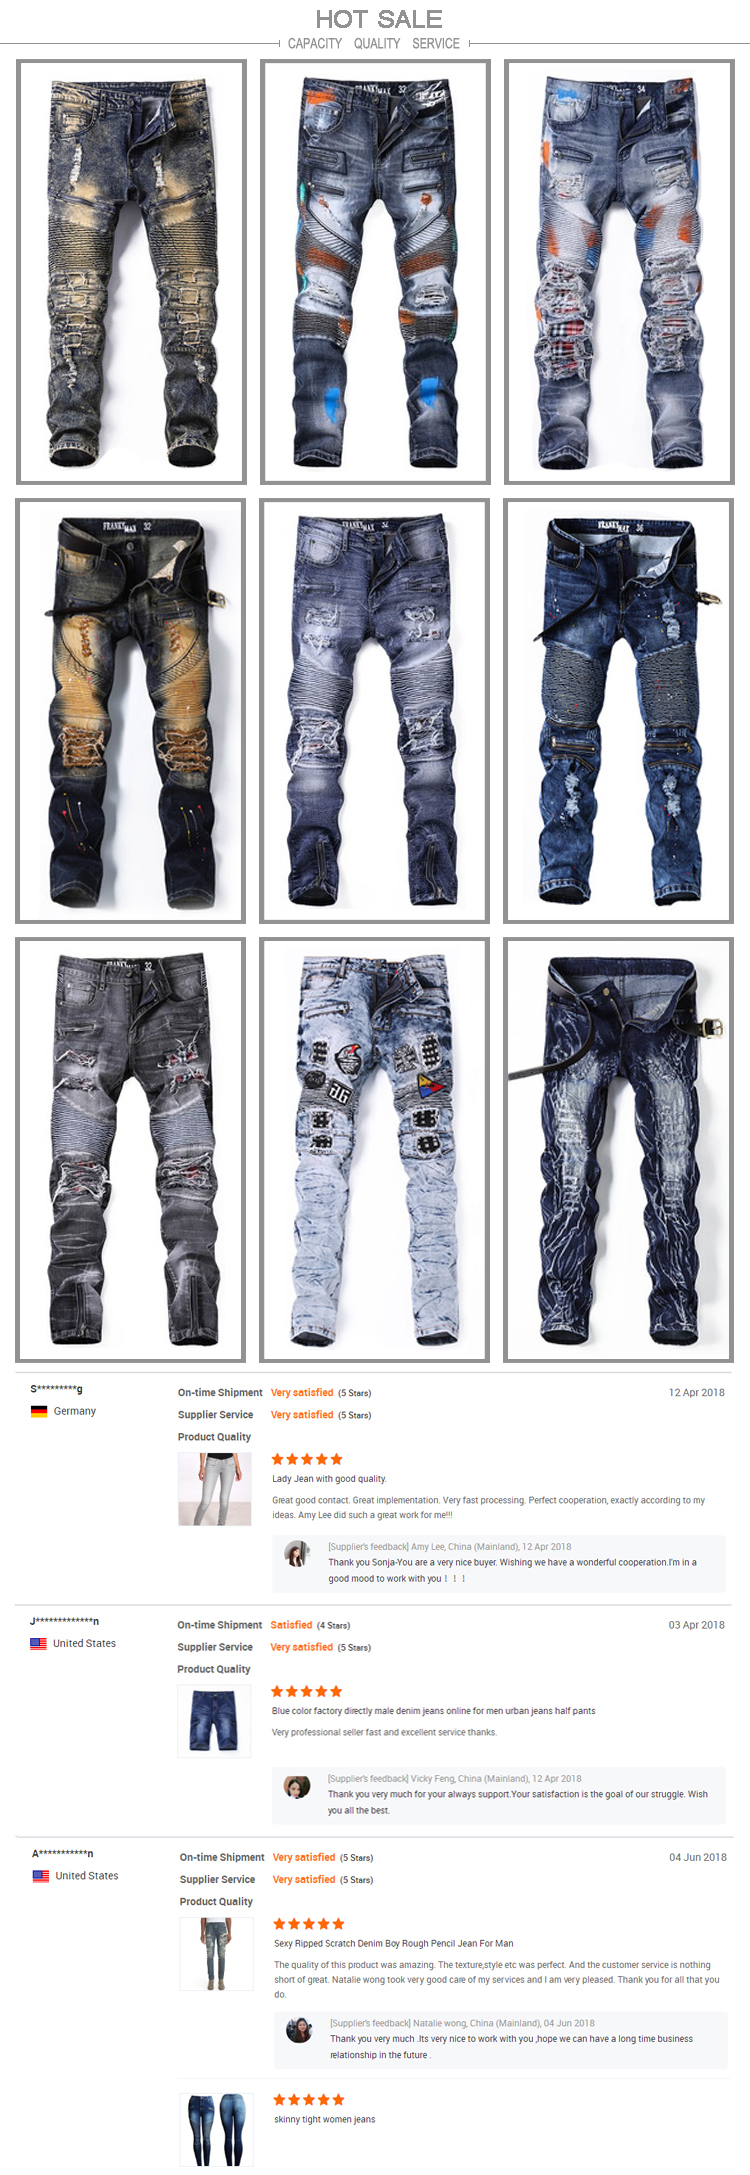 Color Fade Proof Dark Blue Biker Style Boys Damaged Painted Denim Lea Orange Label Slim Fit Jeans Pants Hitam Hot Sale